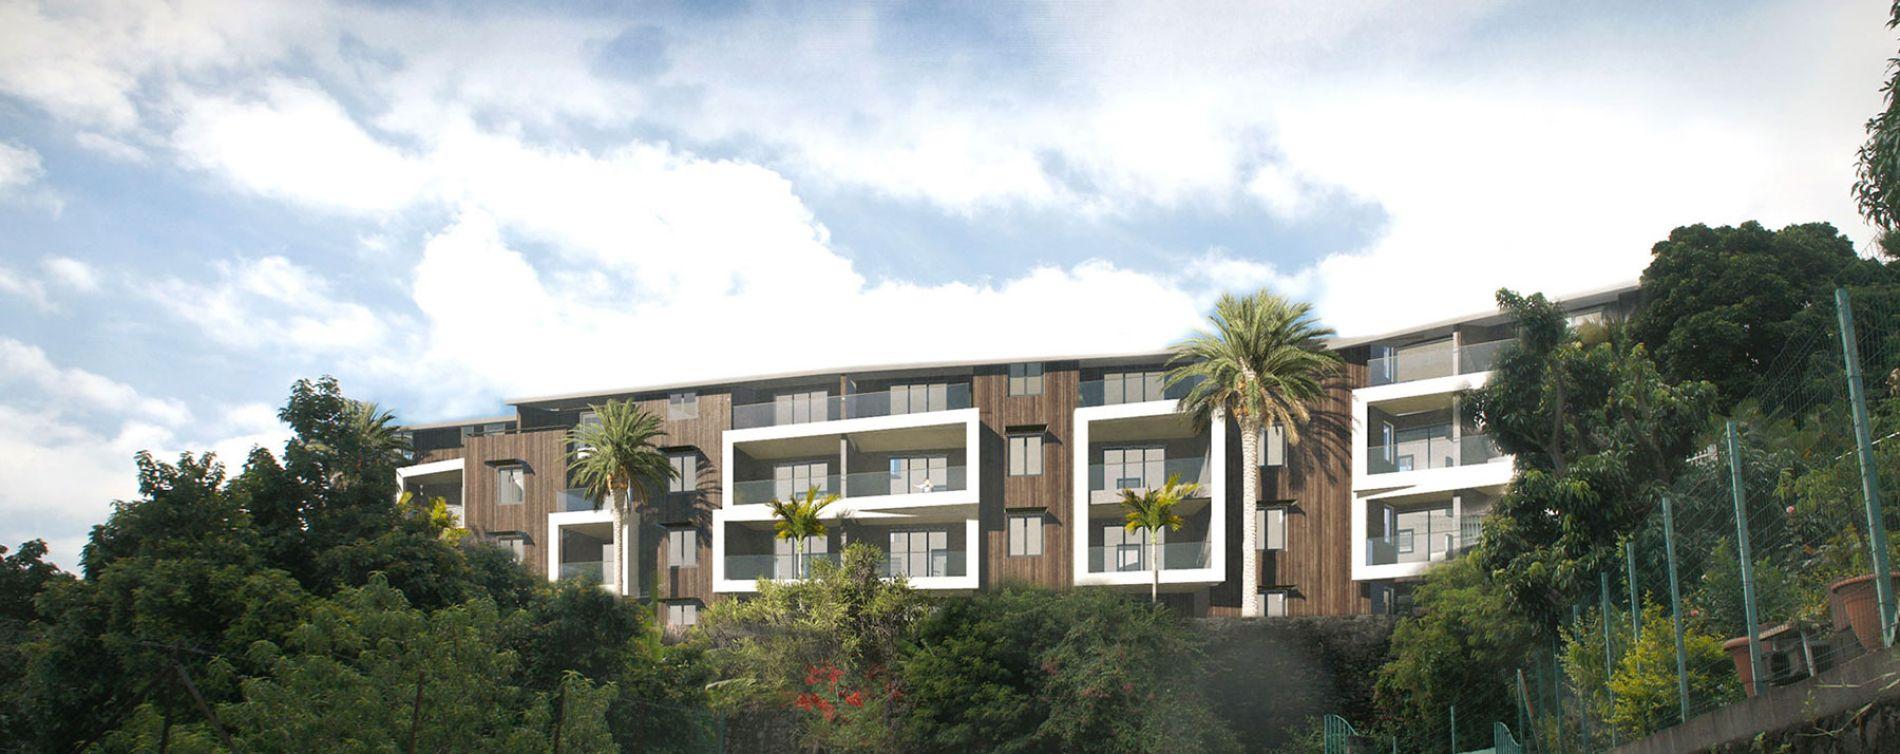 castel roc saint denis programme immobilier neuf n 213512. Black Bedroom Furniture Sets. Home Design Ideas